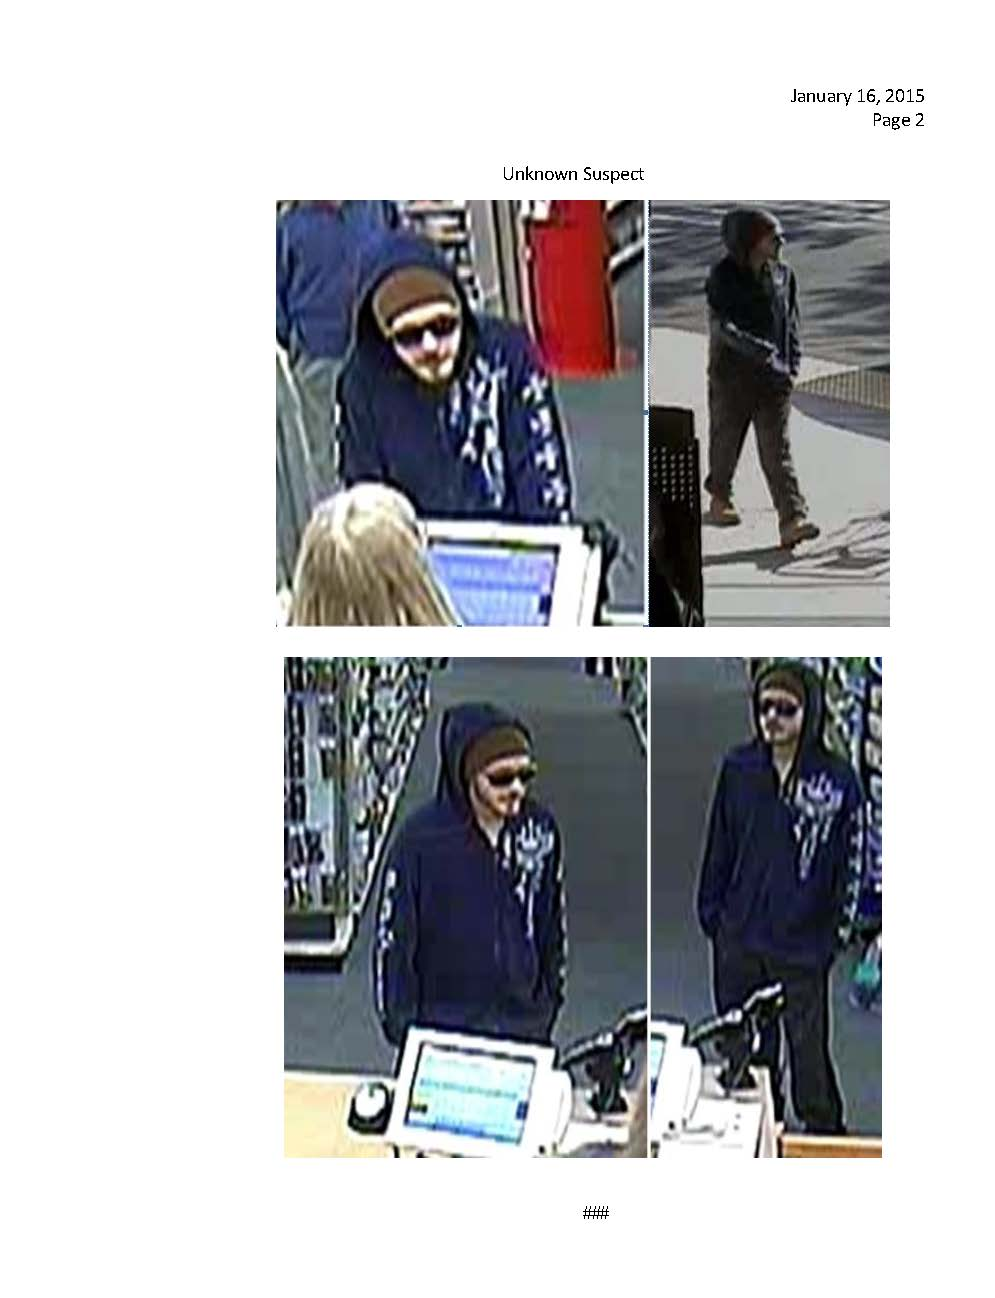 011615 CVS Pharmacy Robbery_Page_2